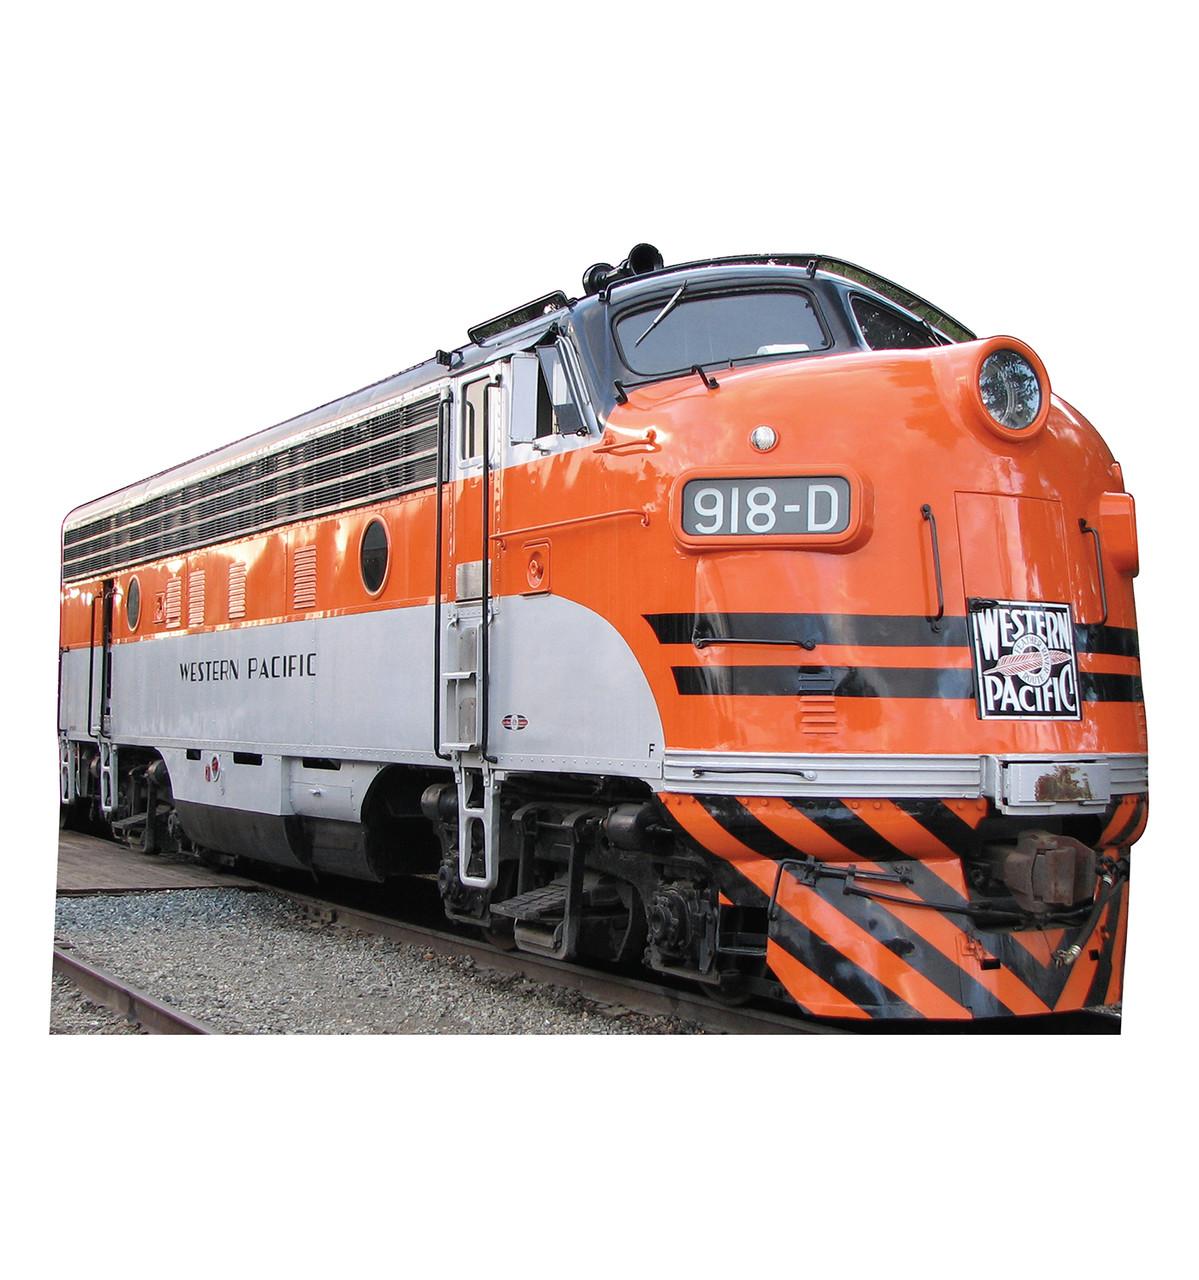 WP 918D Train Cardboard Cutout